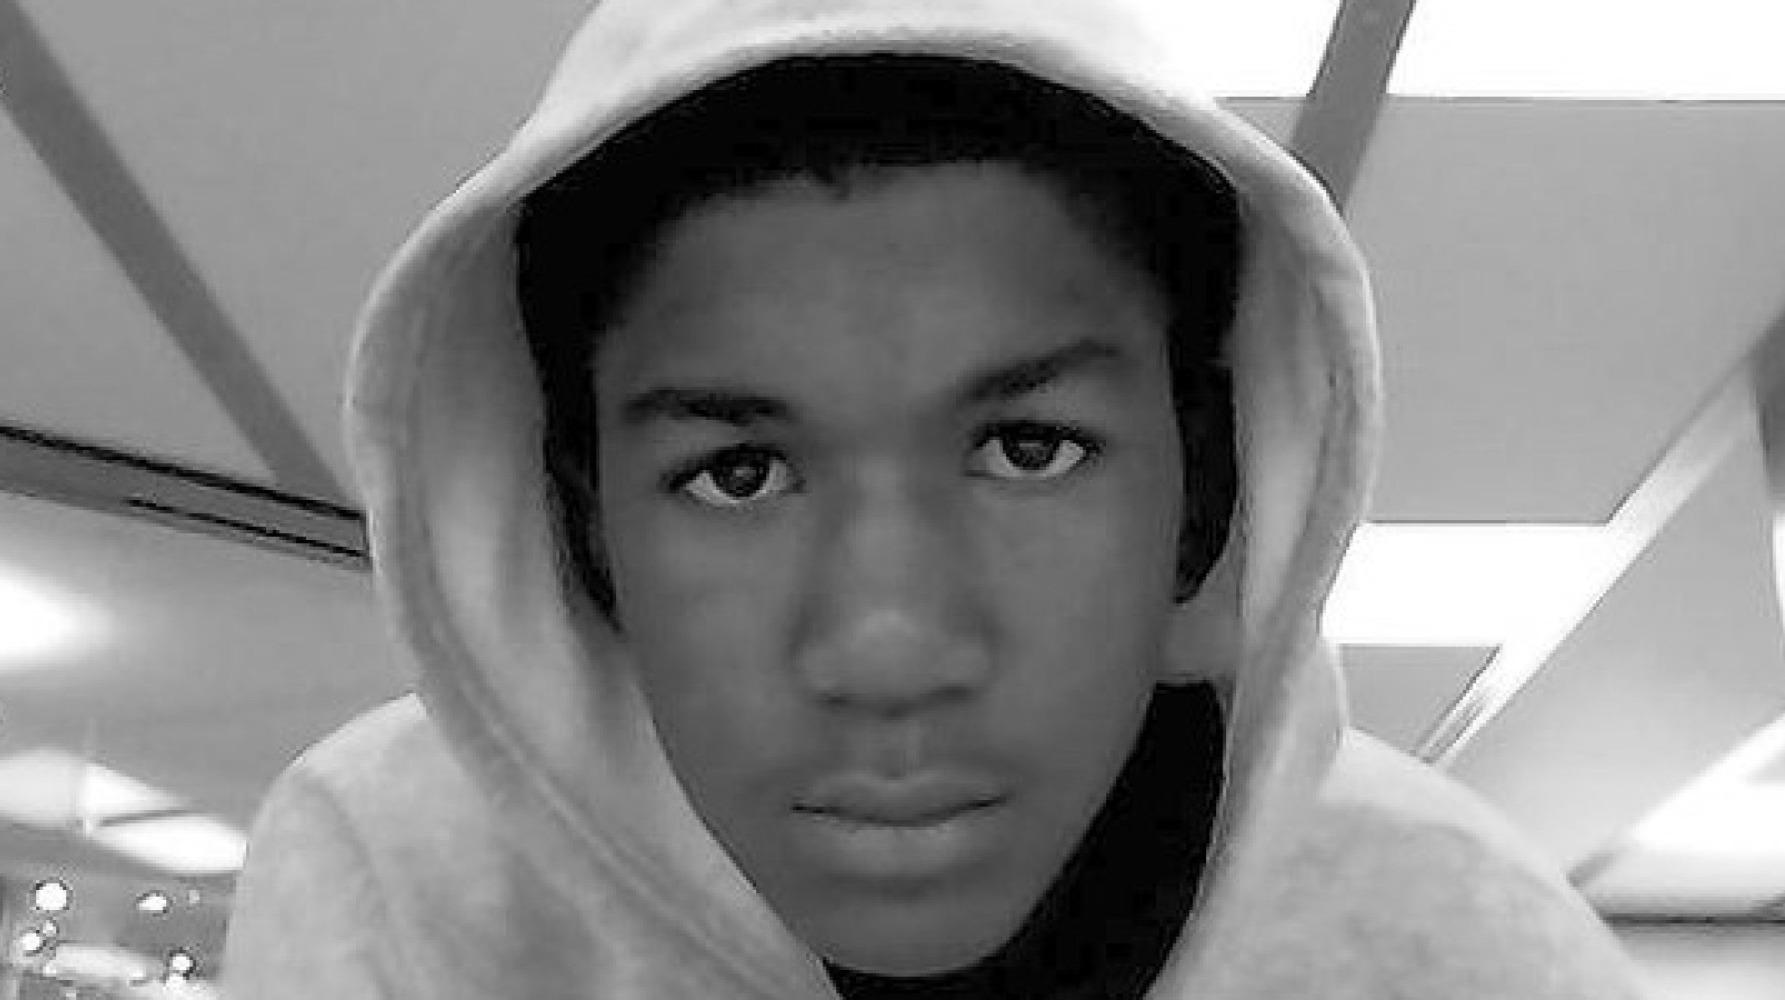 Trayvon Martin wearing a hoodie